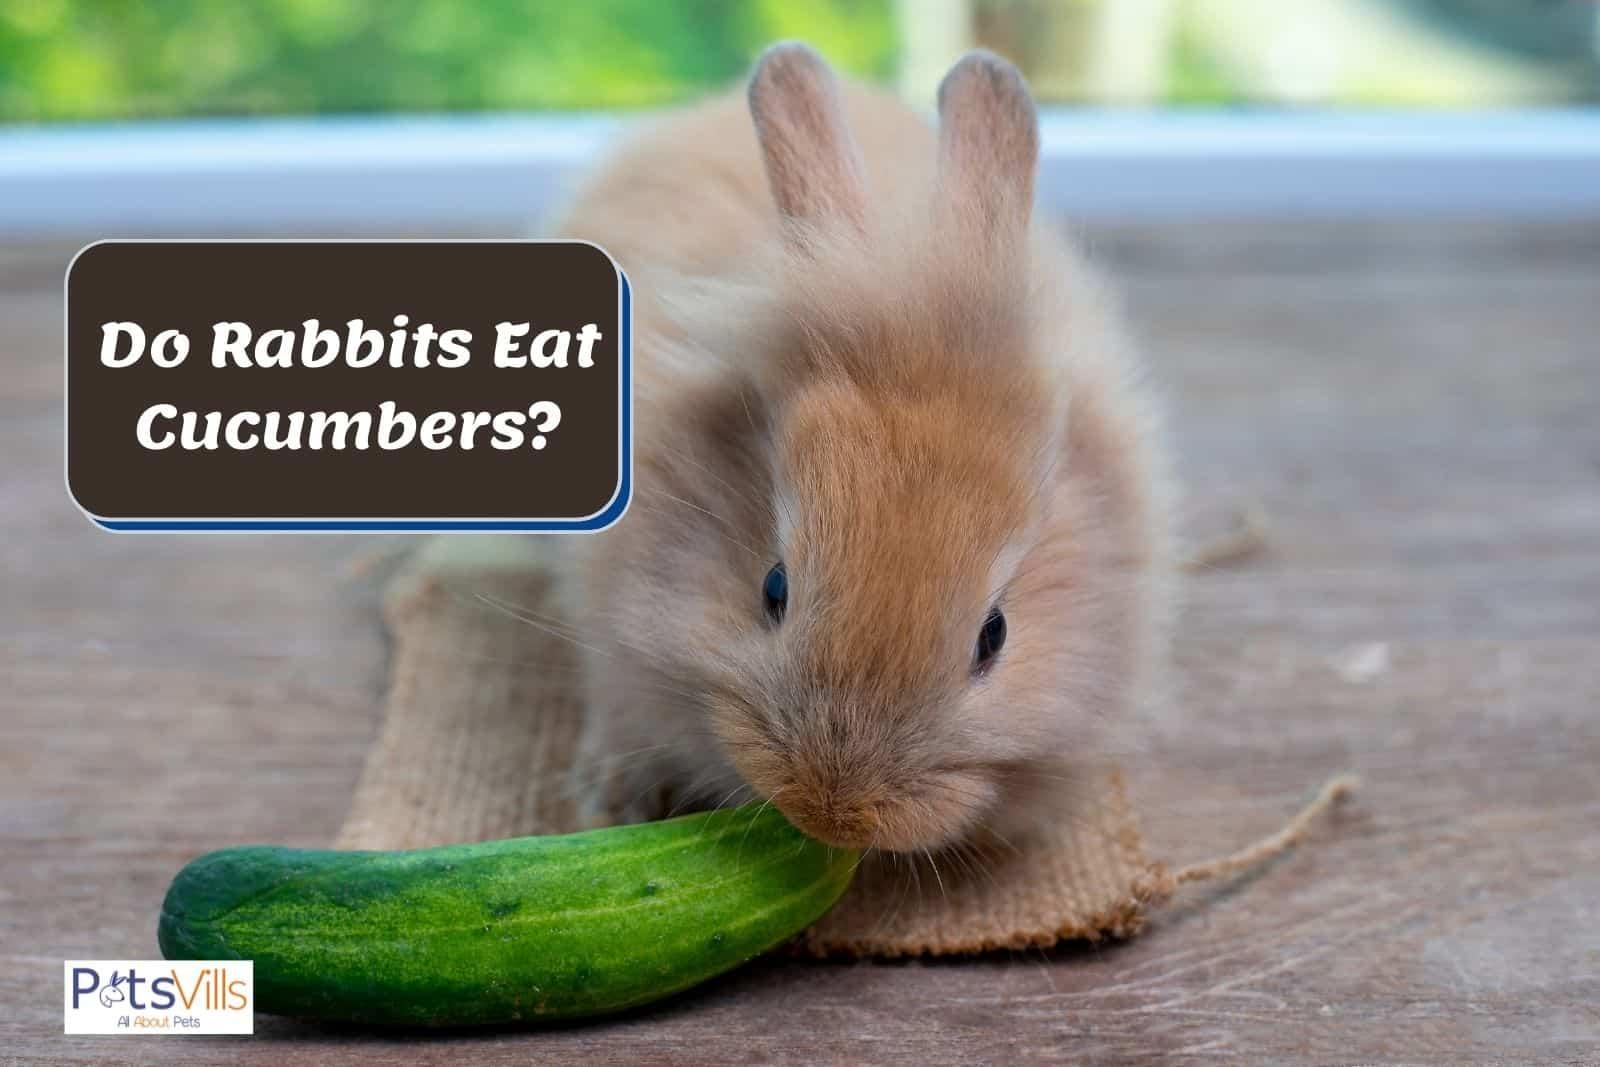 a rabbit eating cucumbers